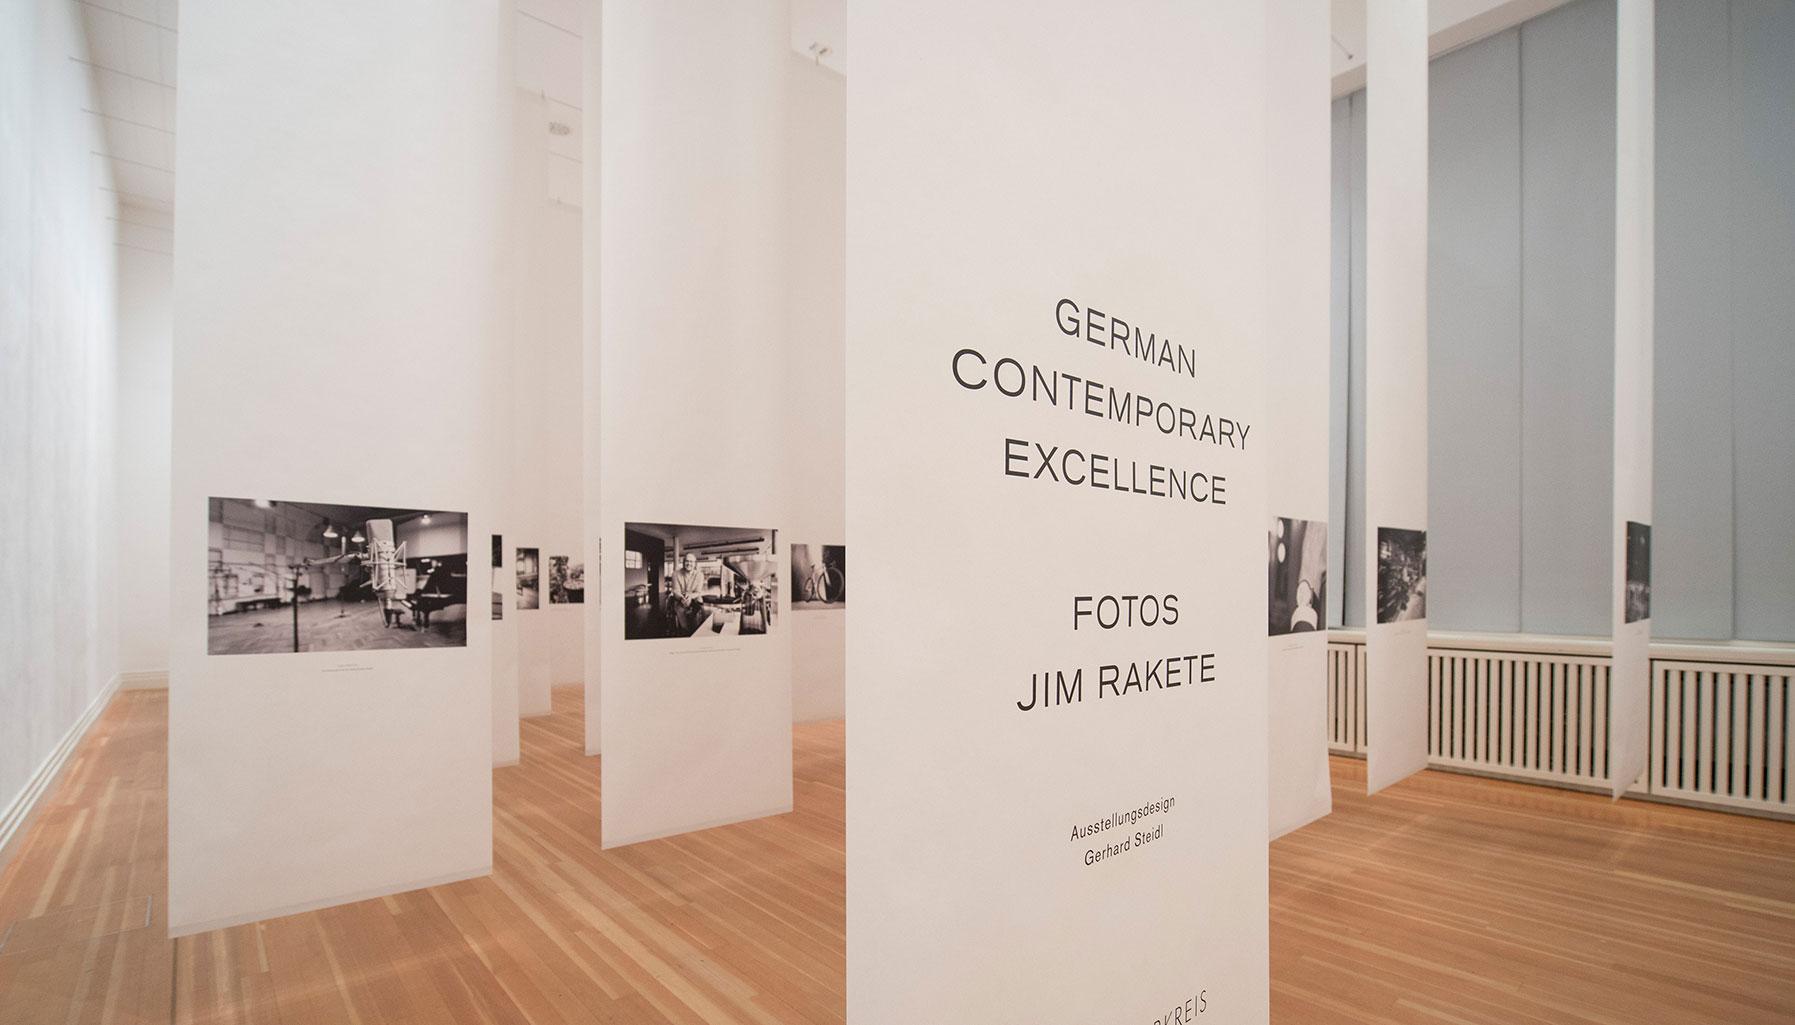 German Contemporary Excellence photo exhibition